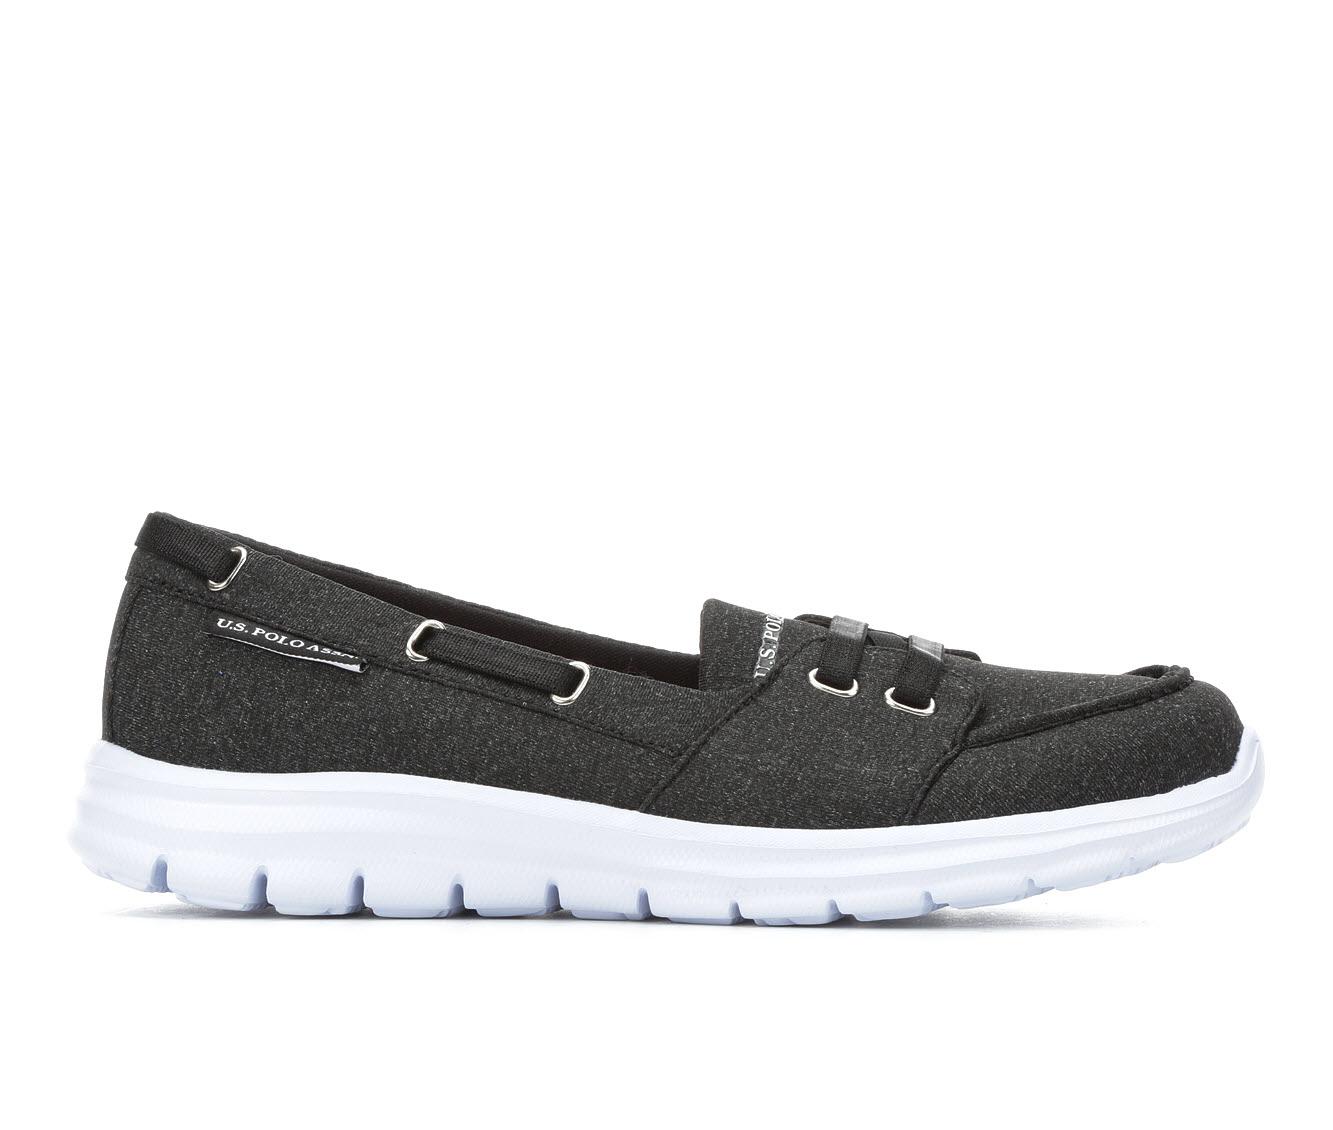 US Polo Assn Kit Women's Shoe (Black Canvas)